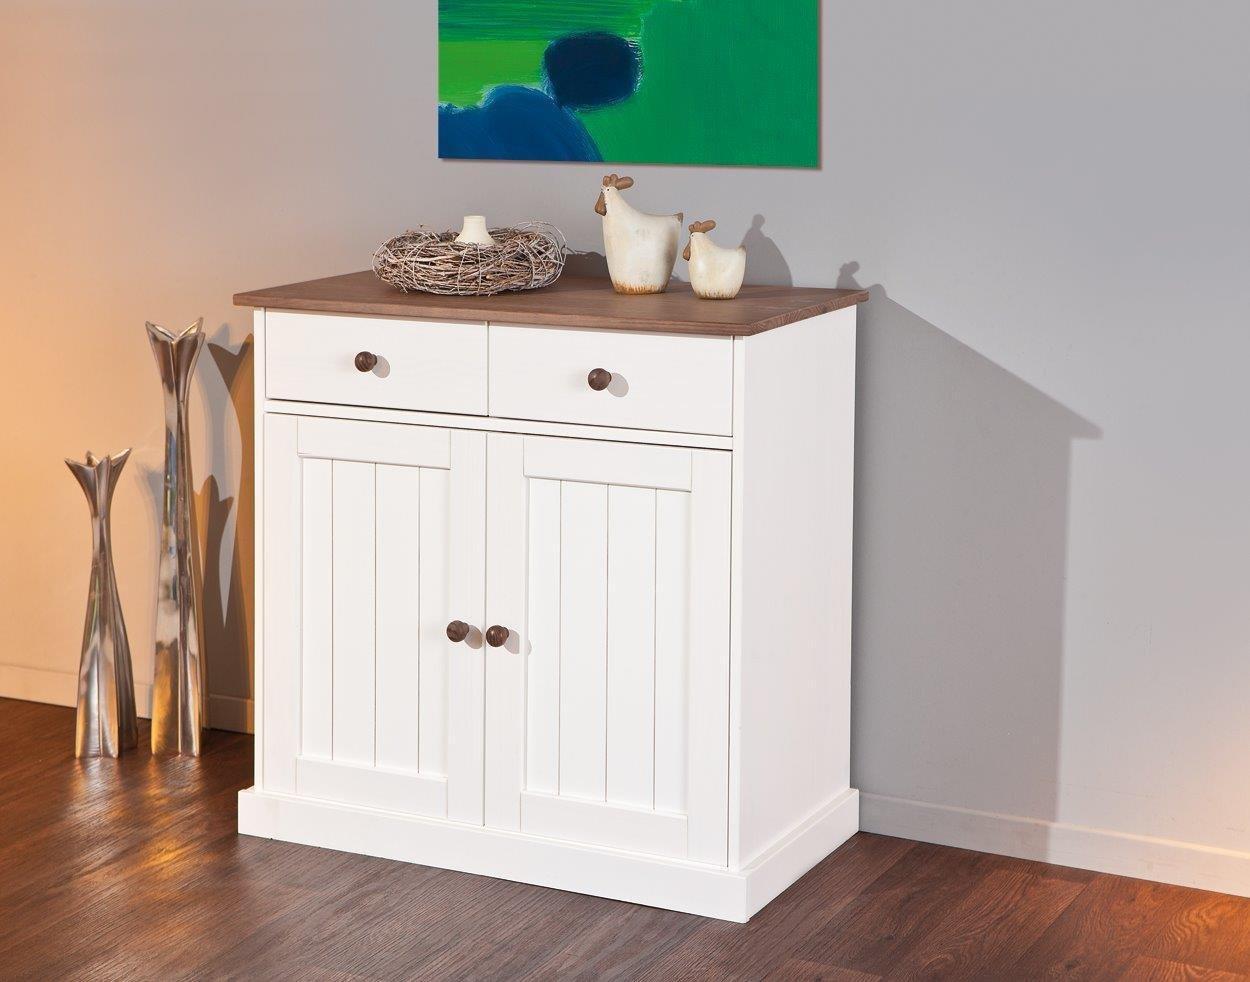 Esidra Meadville Buffet 2 Türen und 2 Schubladen, Holz, Weiß, 90 x 45 x 86 cm